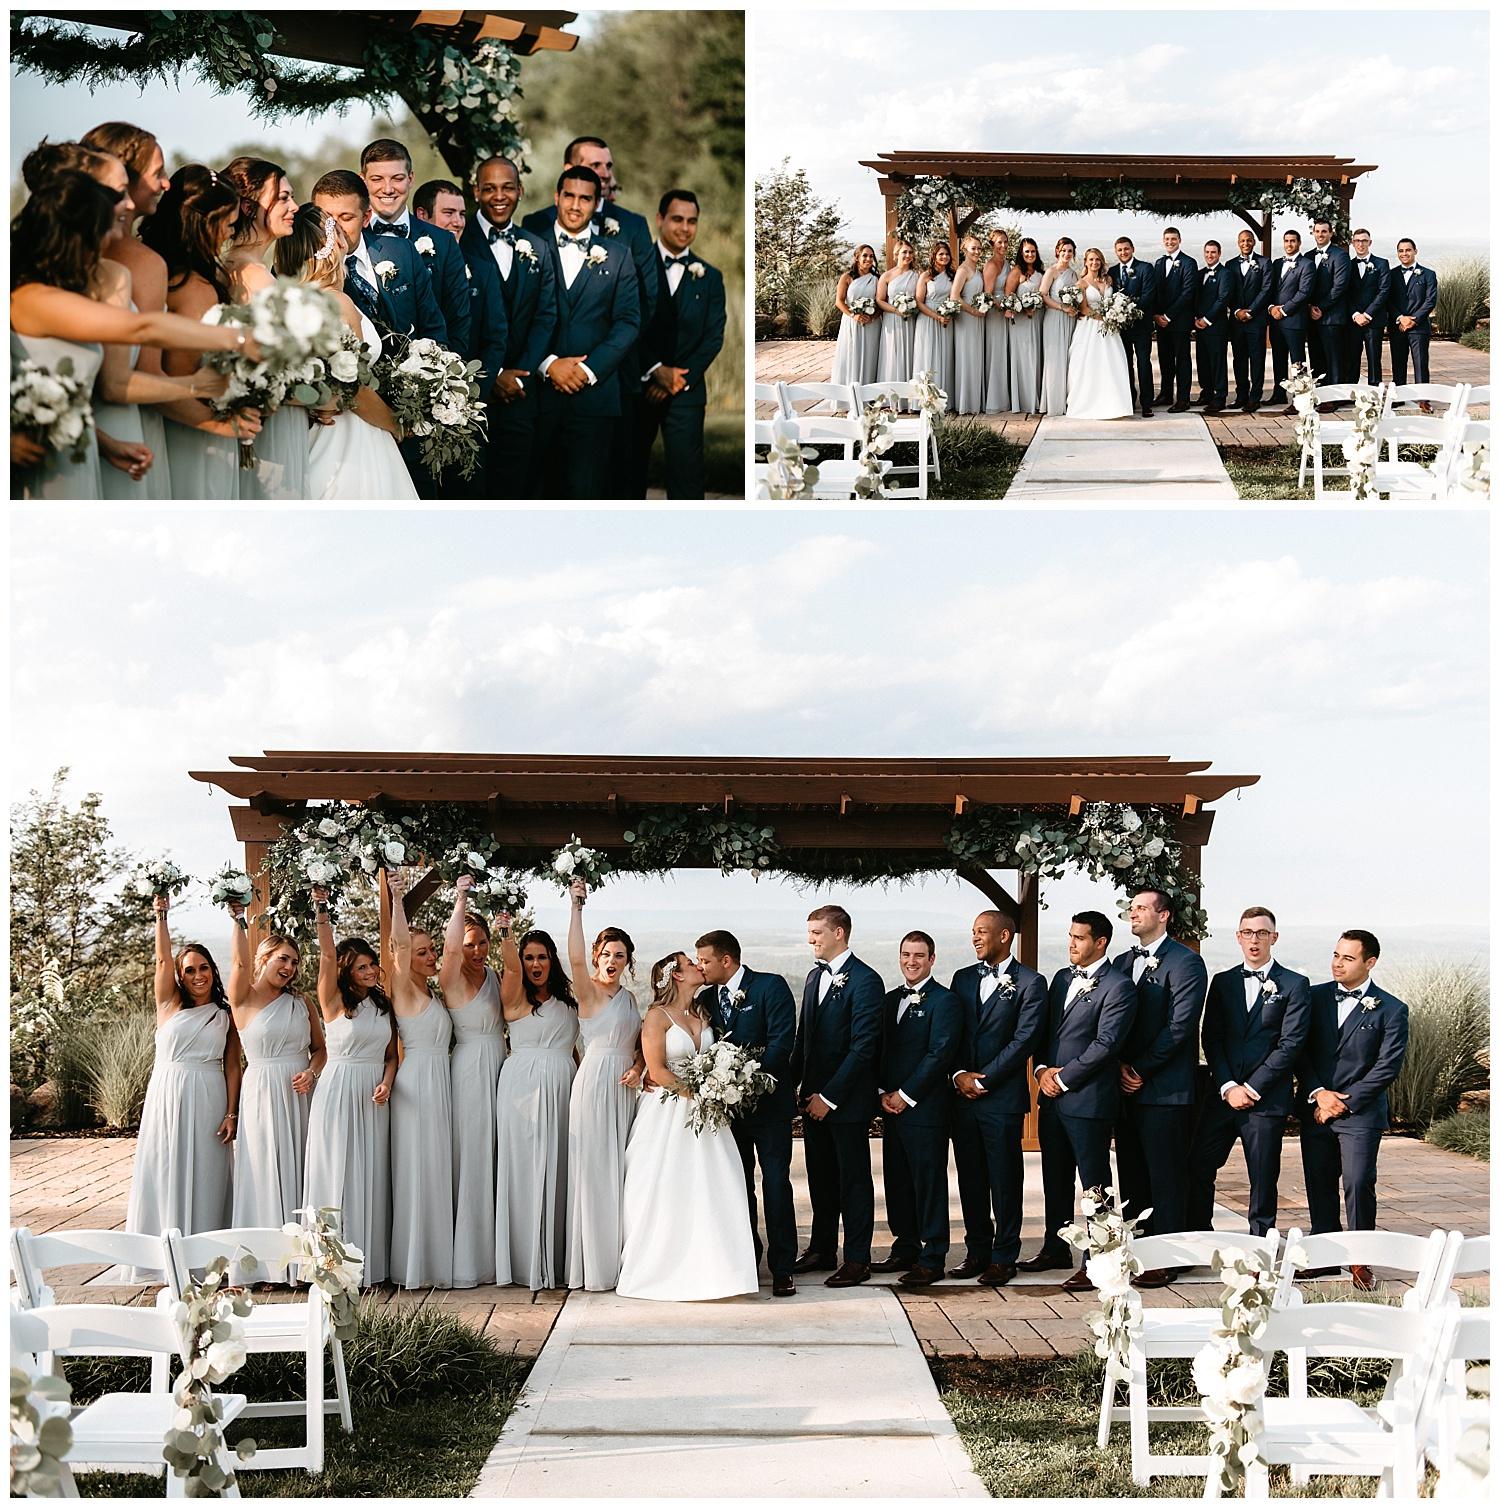 Destination-Wedding-Photographer-in-NEPA-Palmerton-PA_0013.jpg